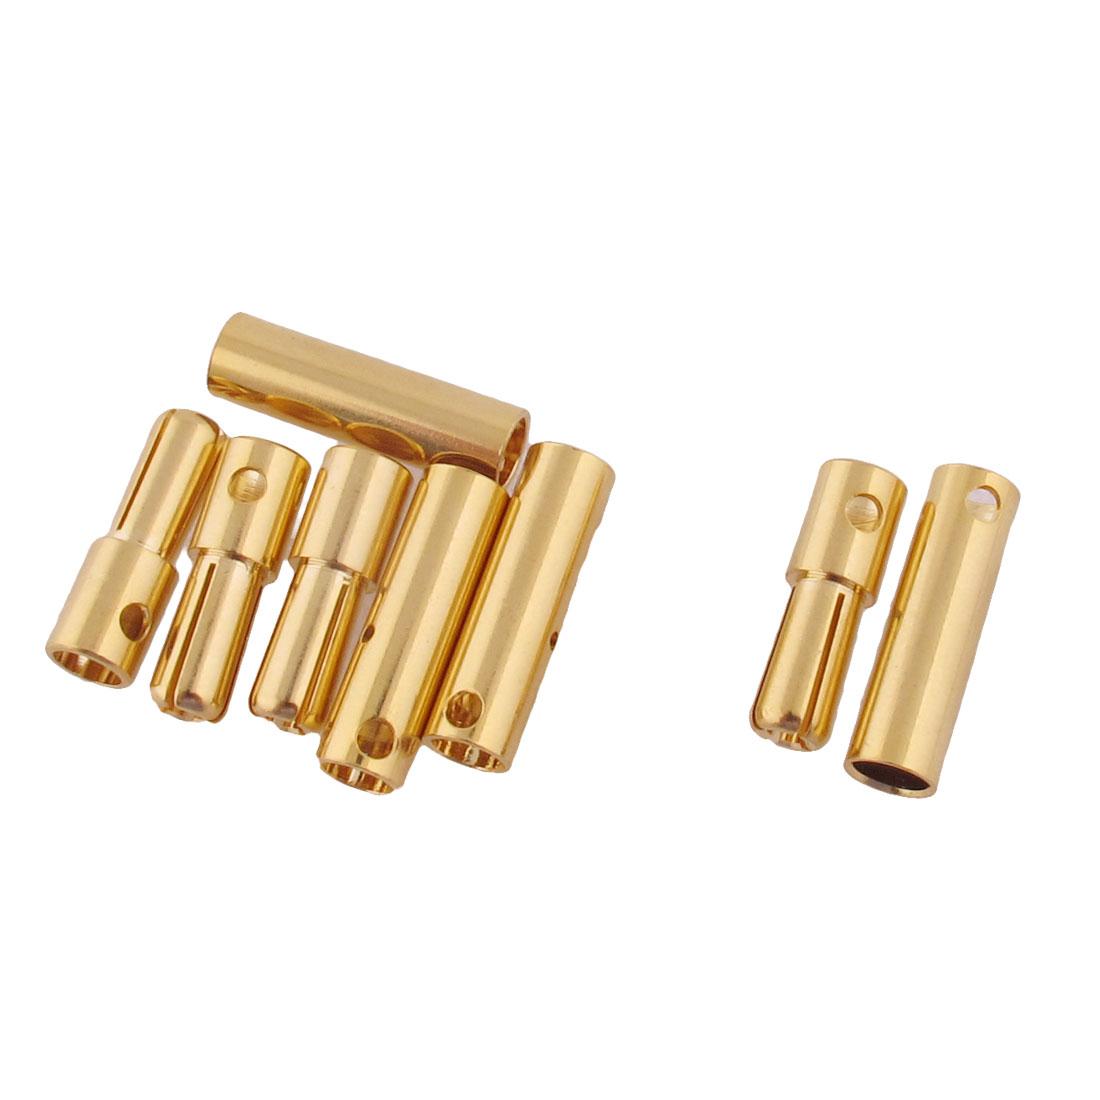 ESC RC LiPo Battery 4mm Male Female Banana Connector Gold Tone 4 Pairs